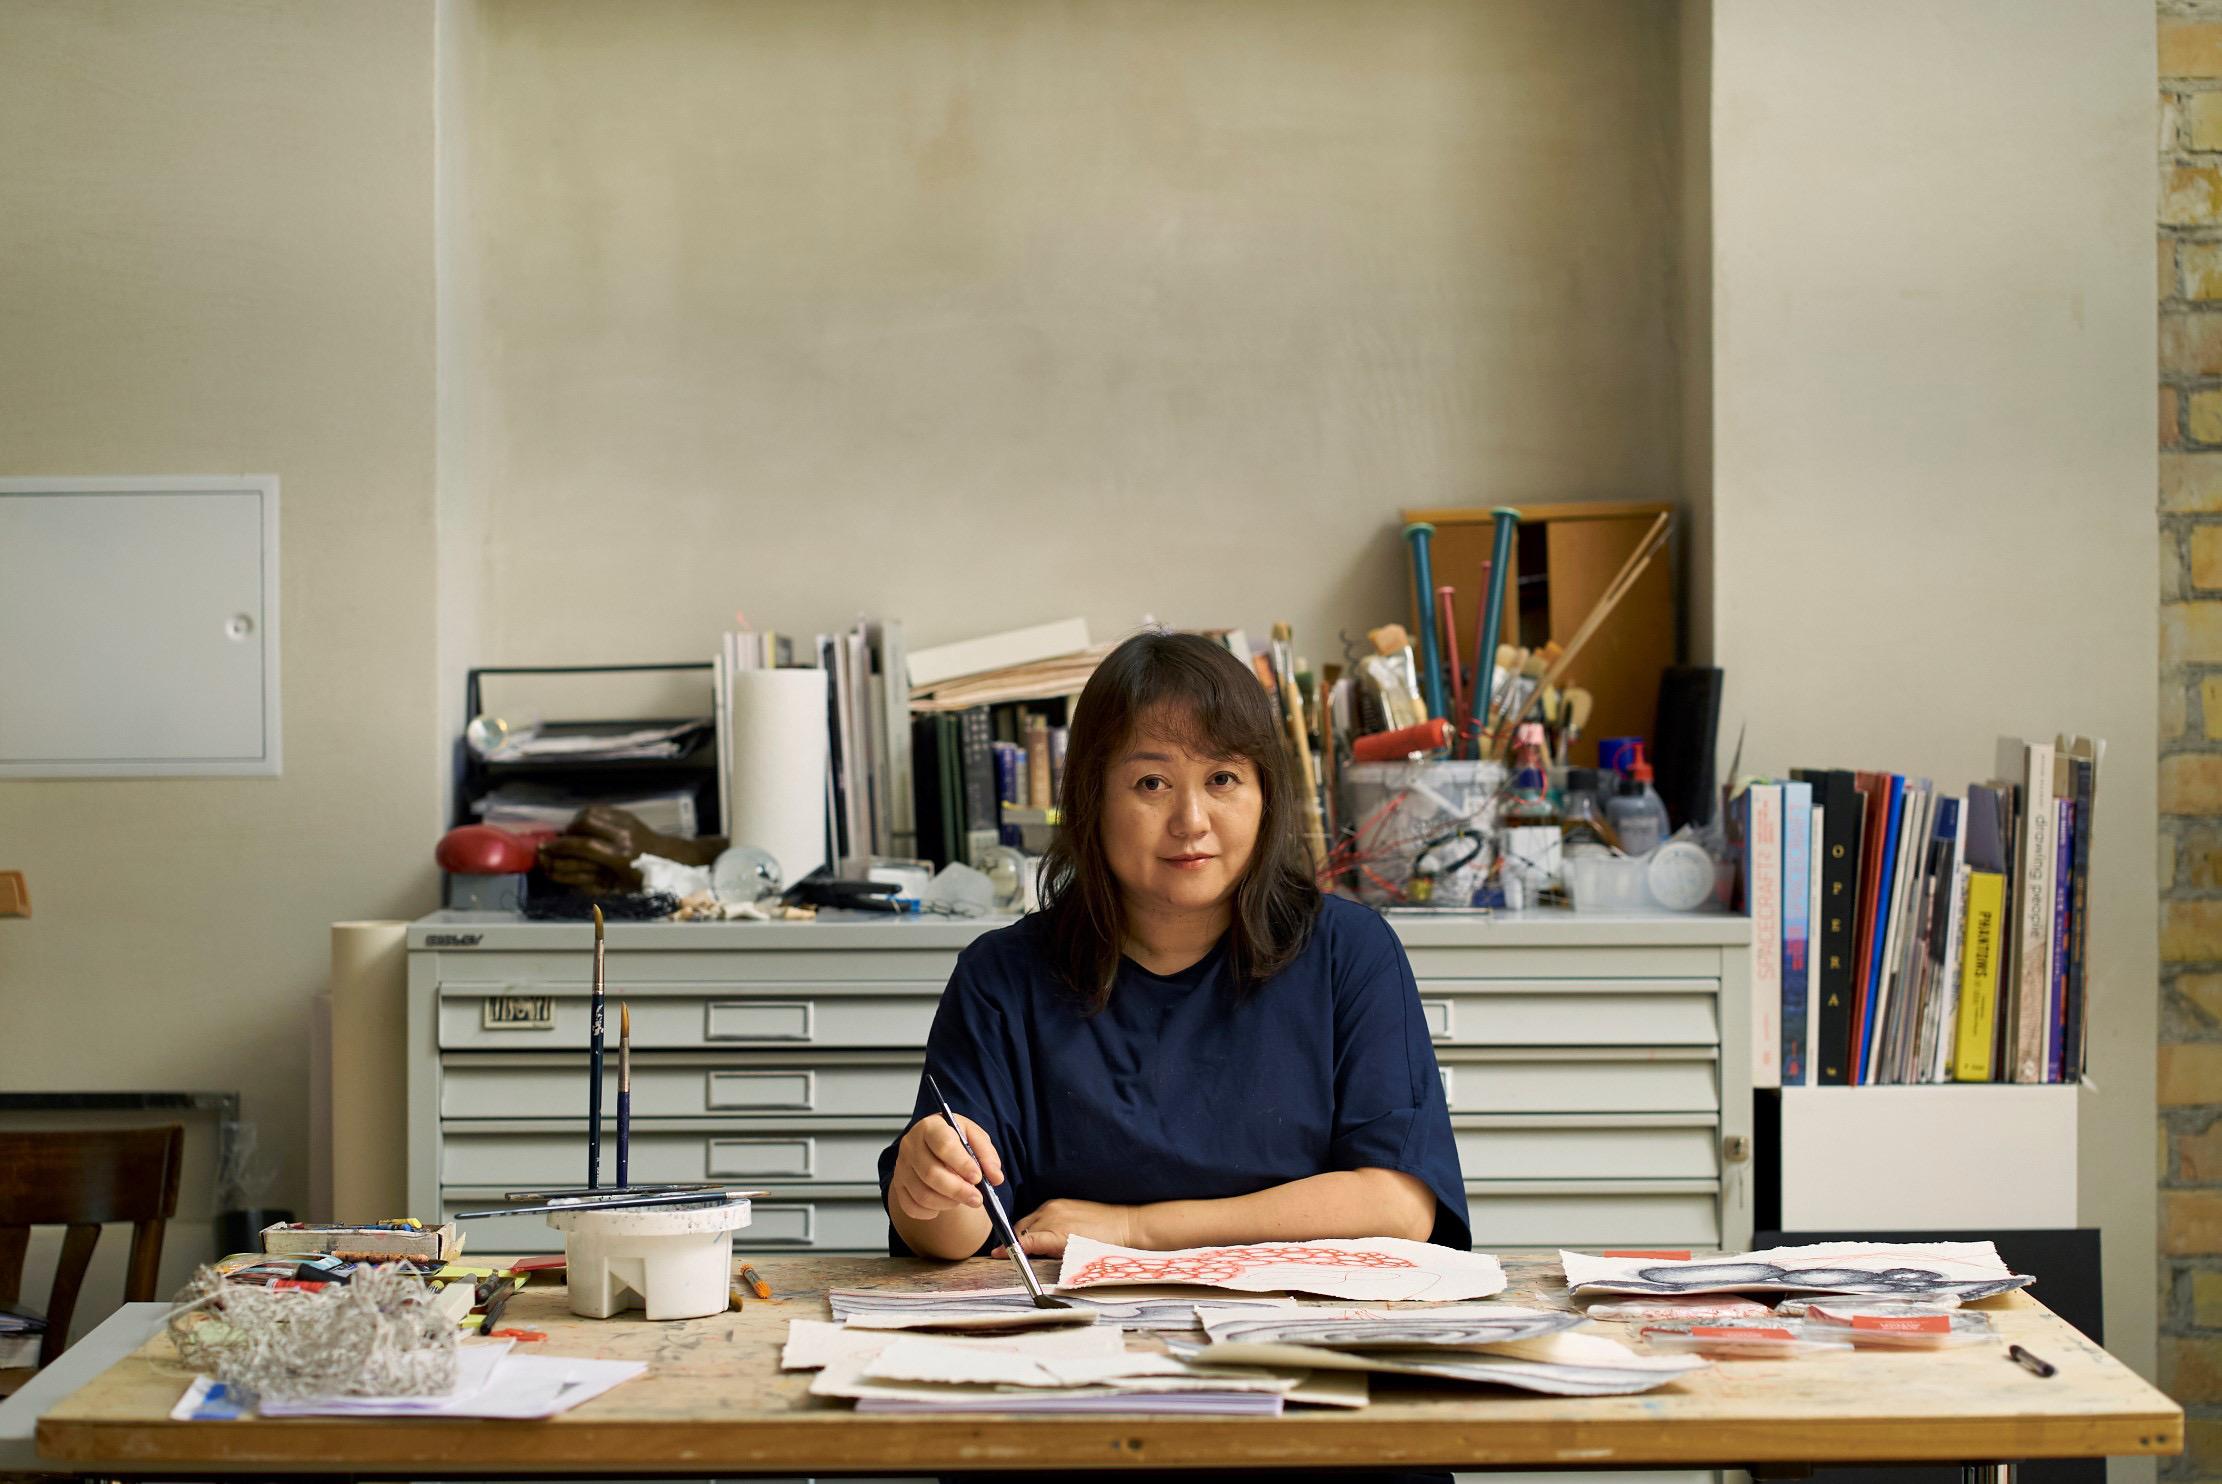 Chiharu Shiota – All Eyes On